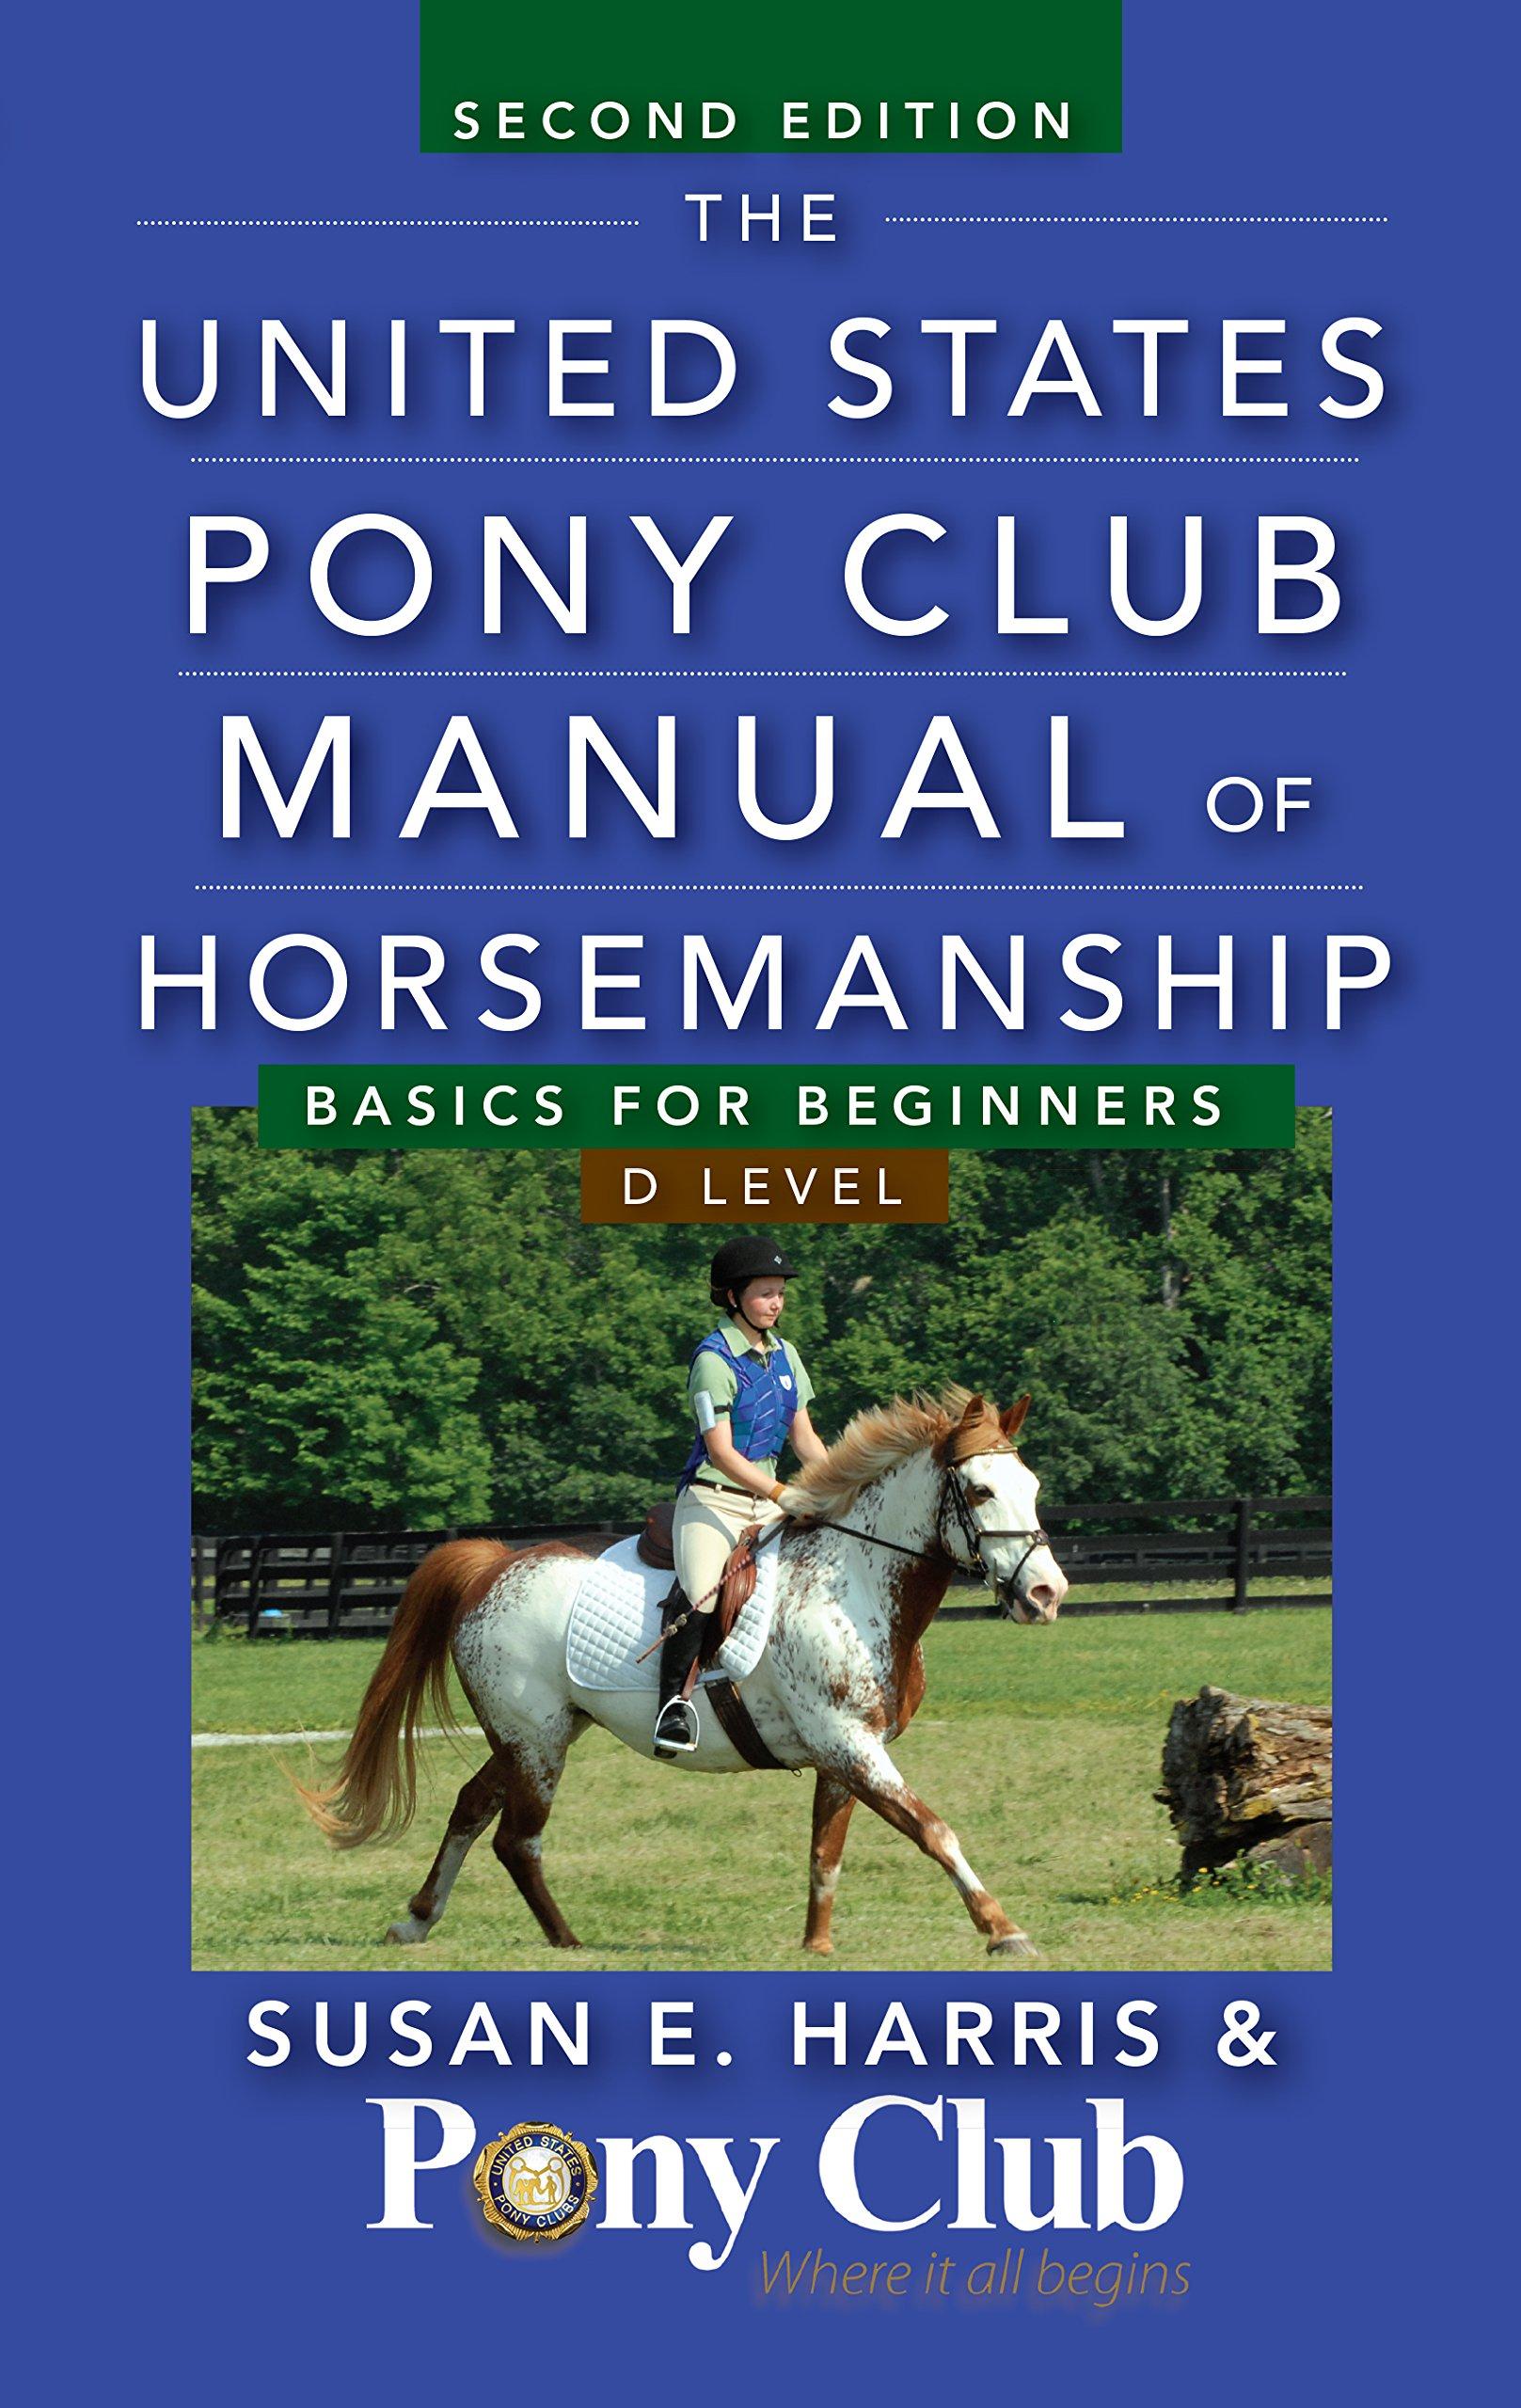 English Saddle Parts Diagram Of Pony Club Getting Ready With Western The United States Manual Horsemanship Basics For Rh Amazon Com A